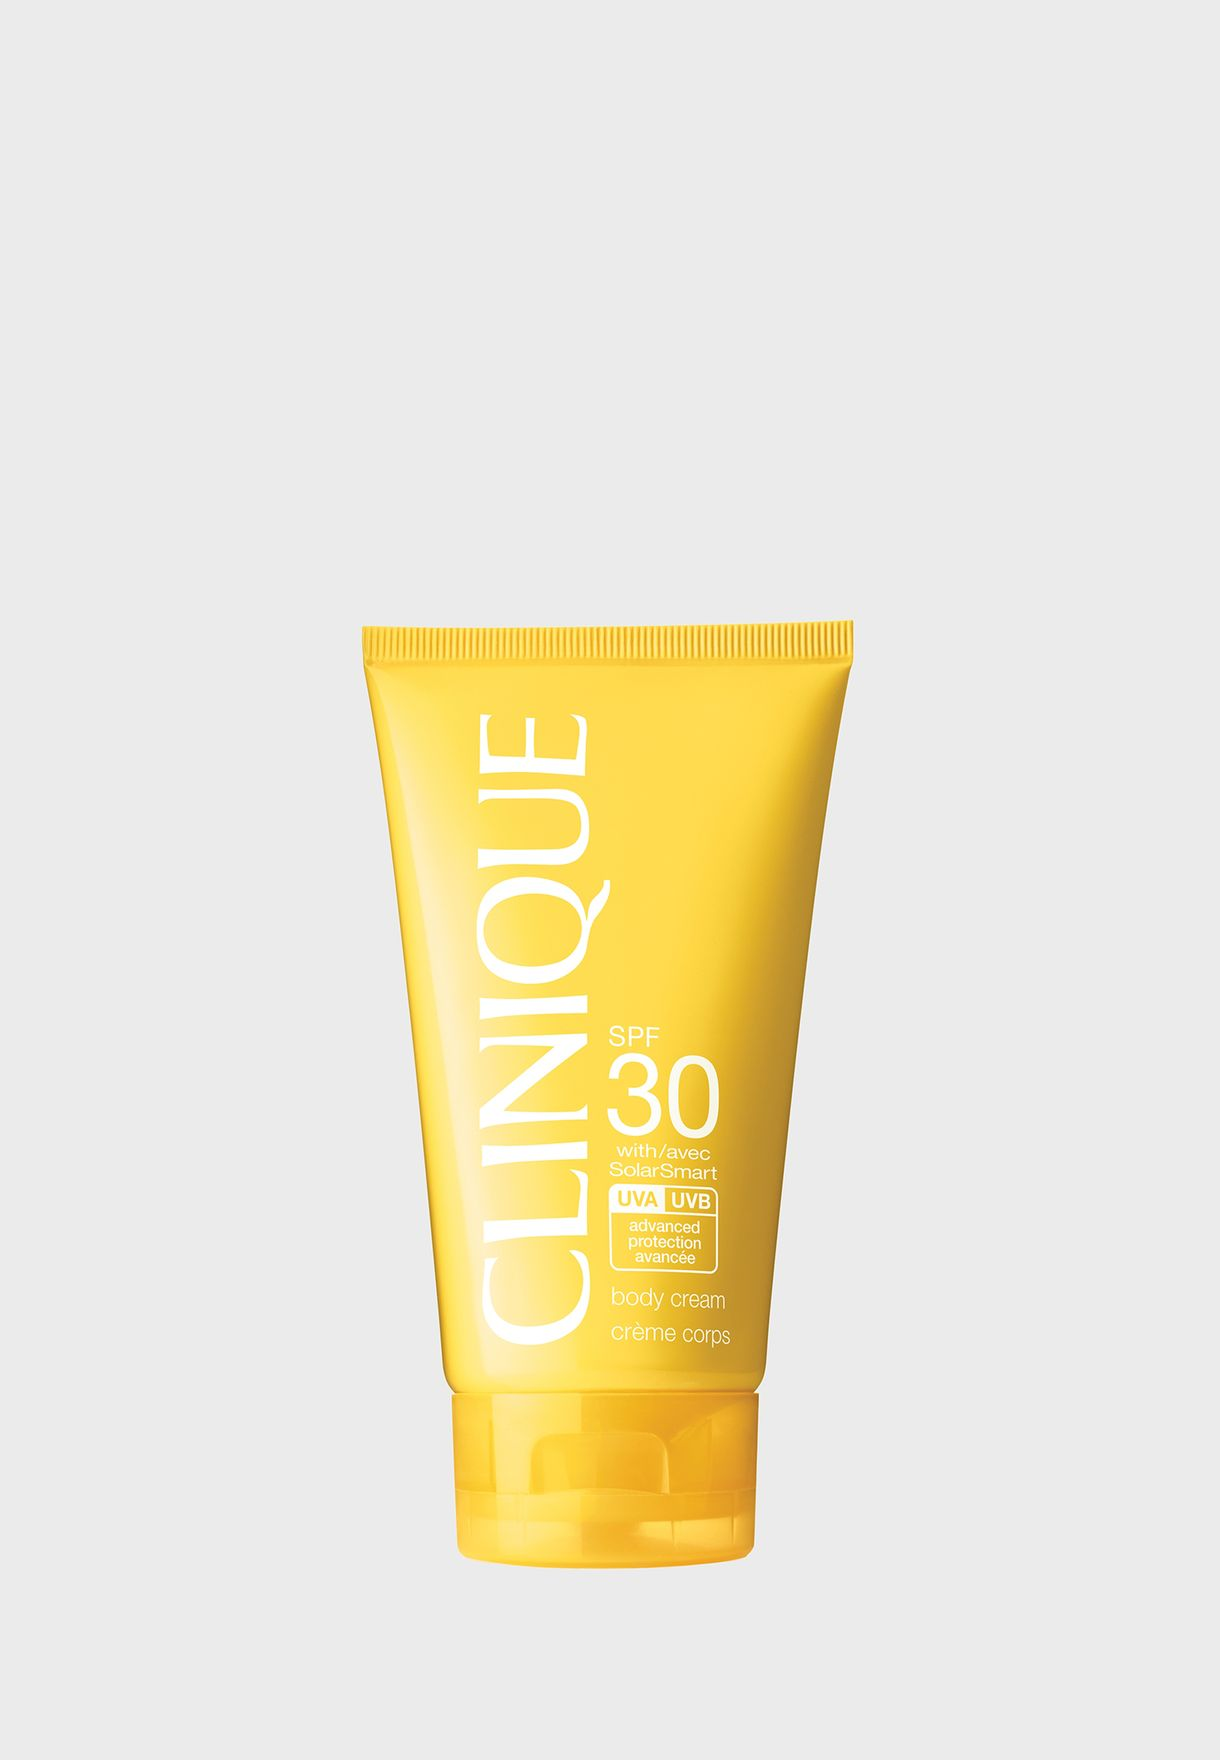 Solar Smart Sunscreen SPF30 50ml